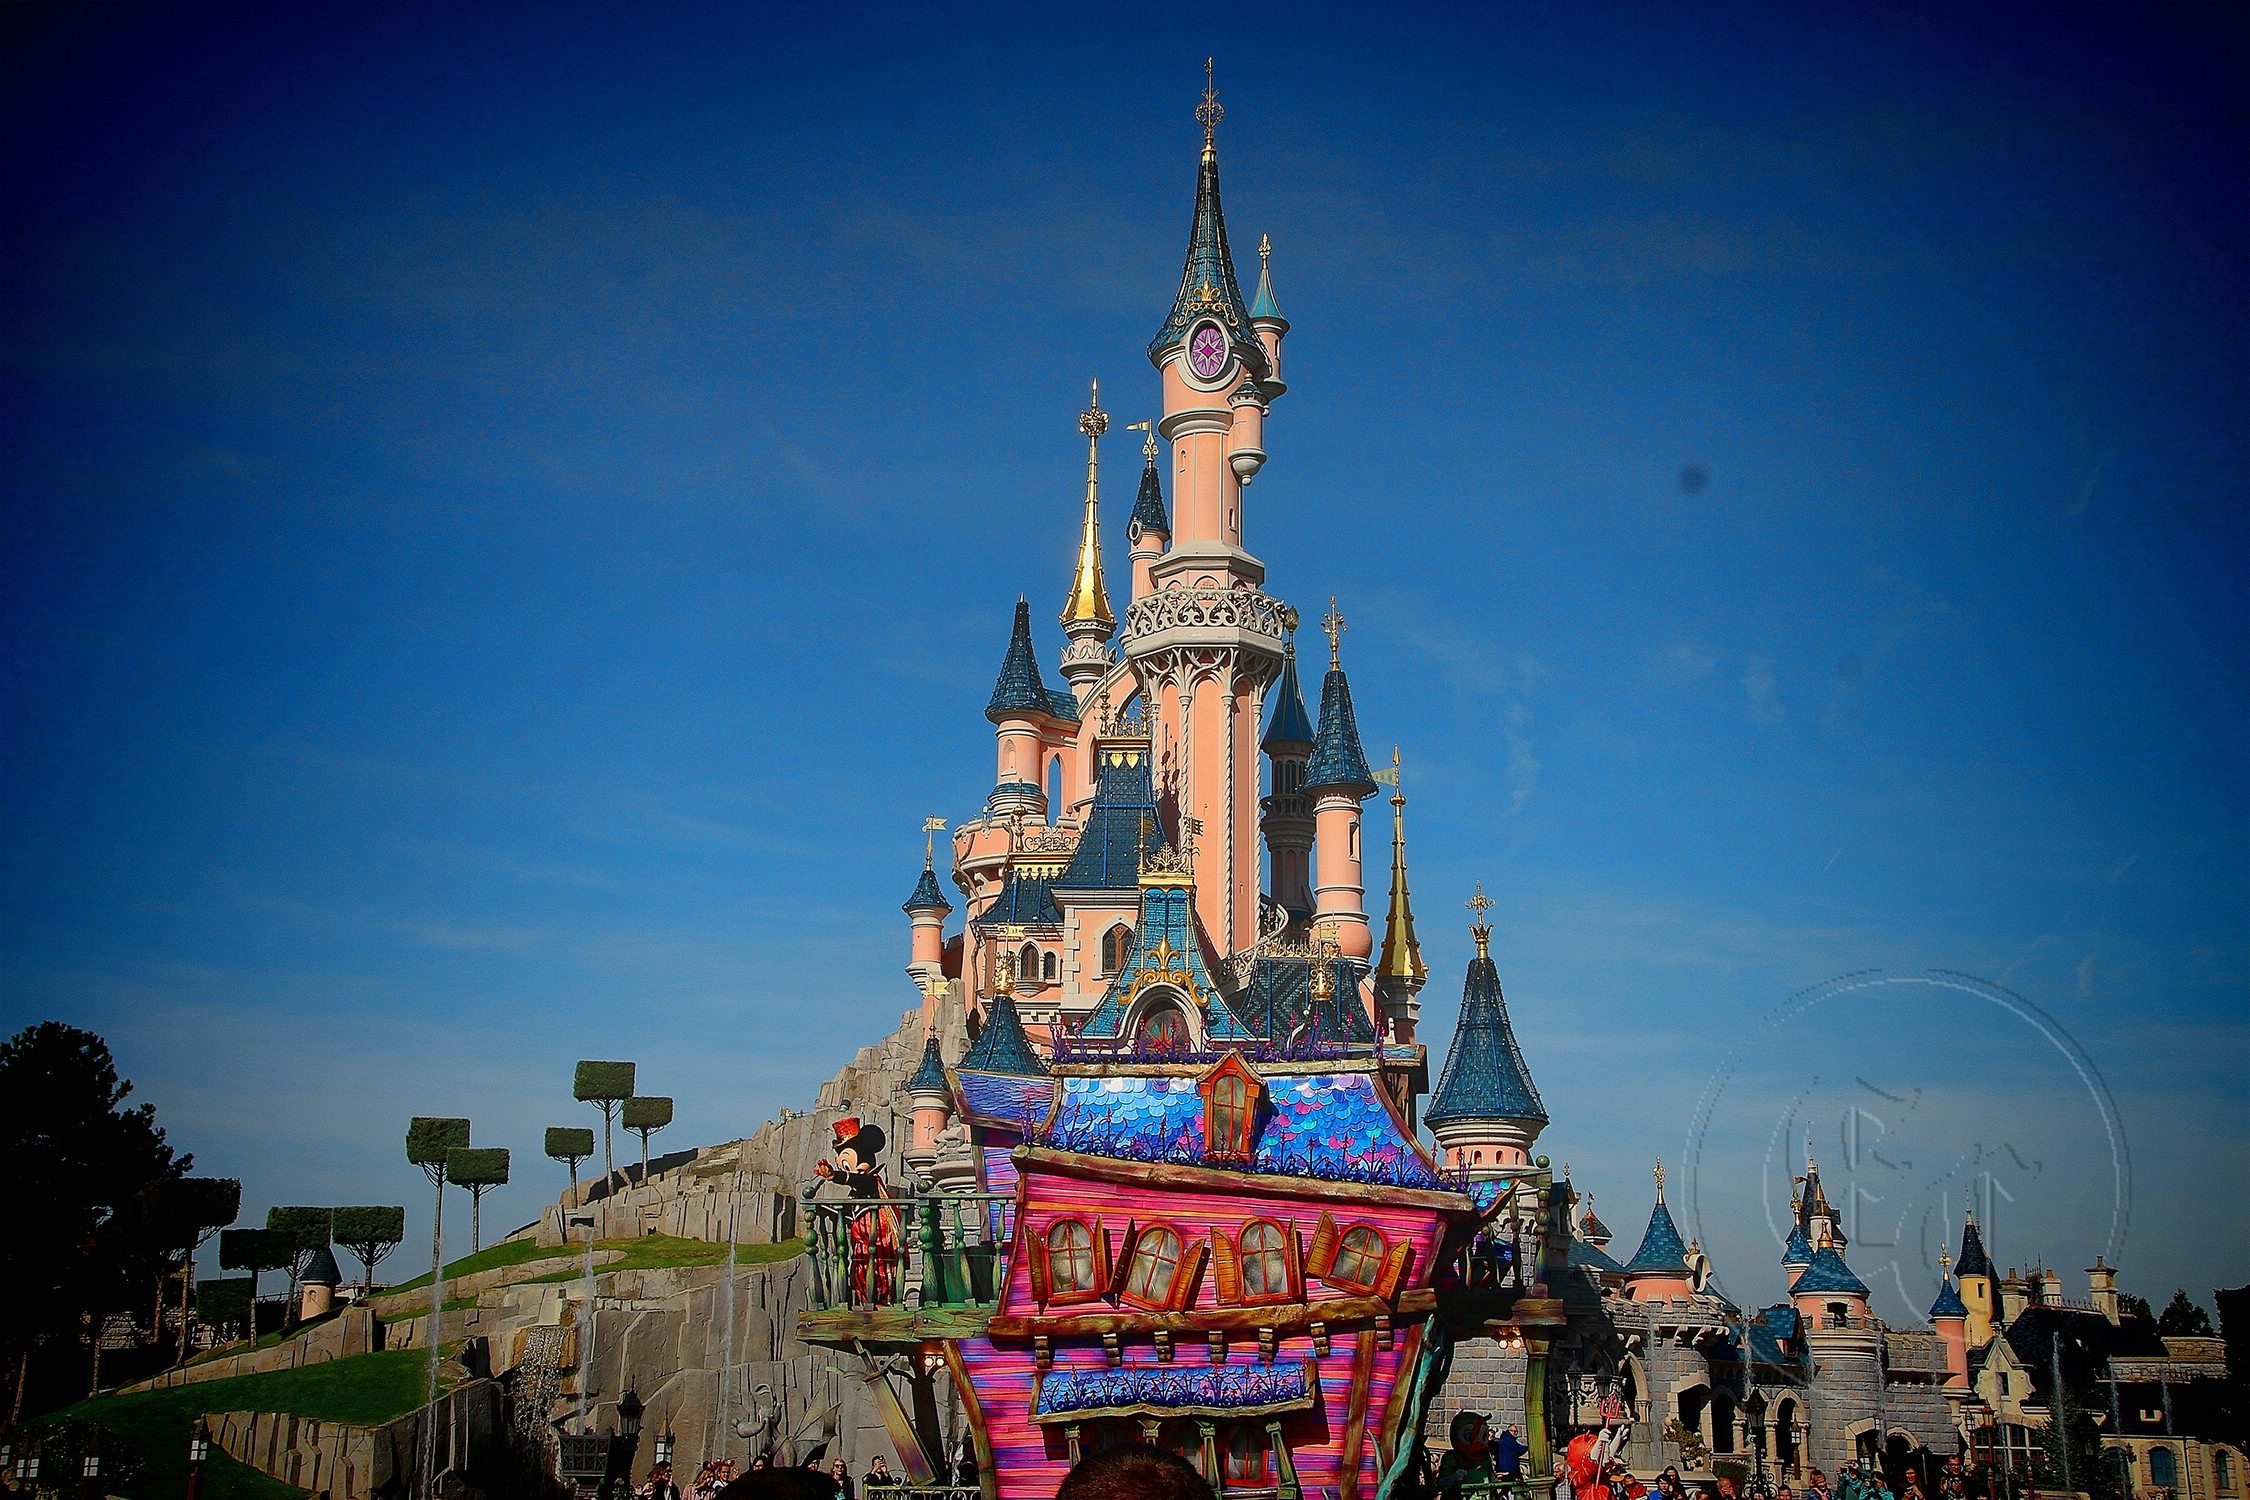 2018 - Festival Halloween Disney® 2018 dal 1/10 al 4/11 - Pagina 6 Img_7924